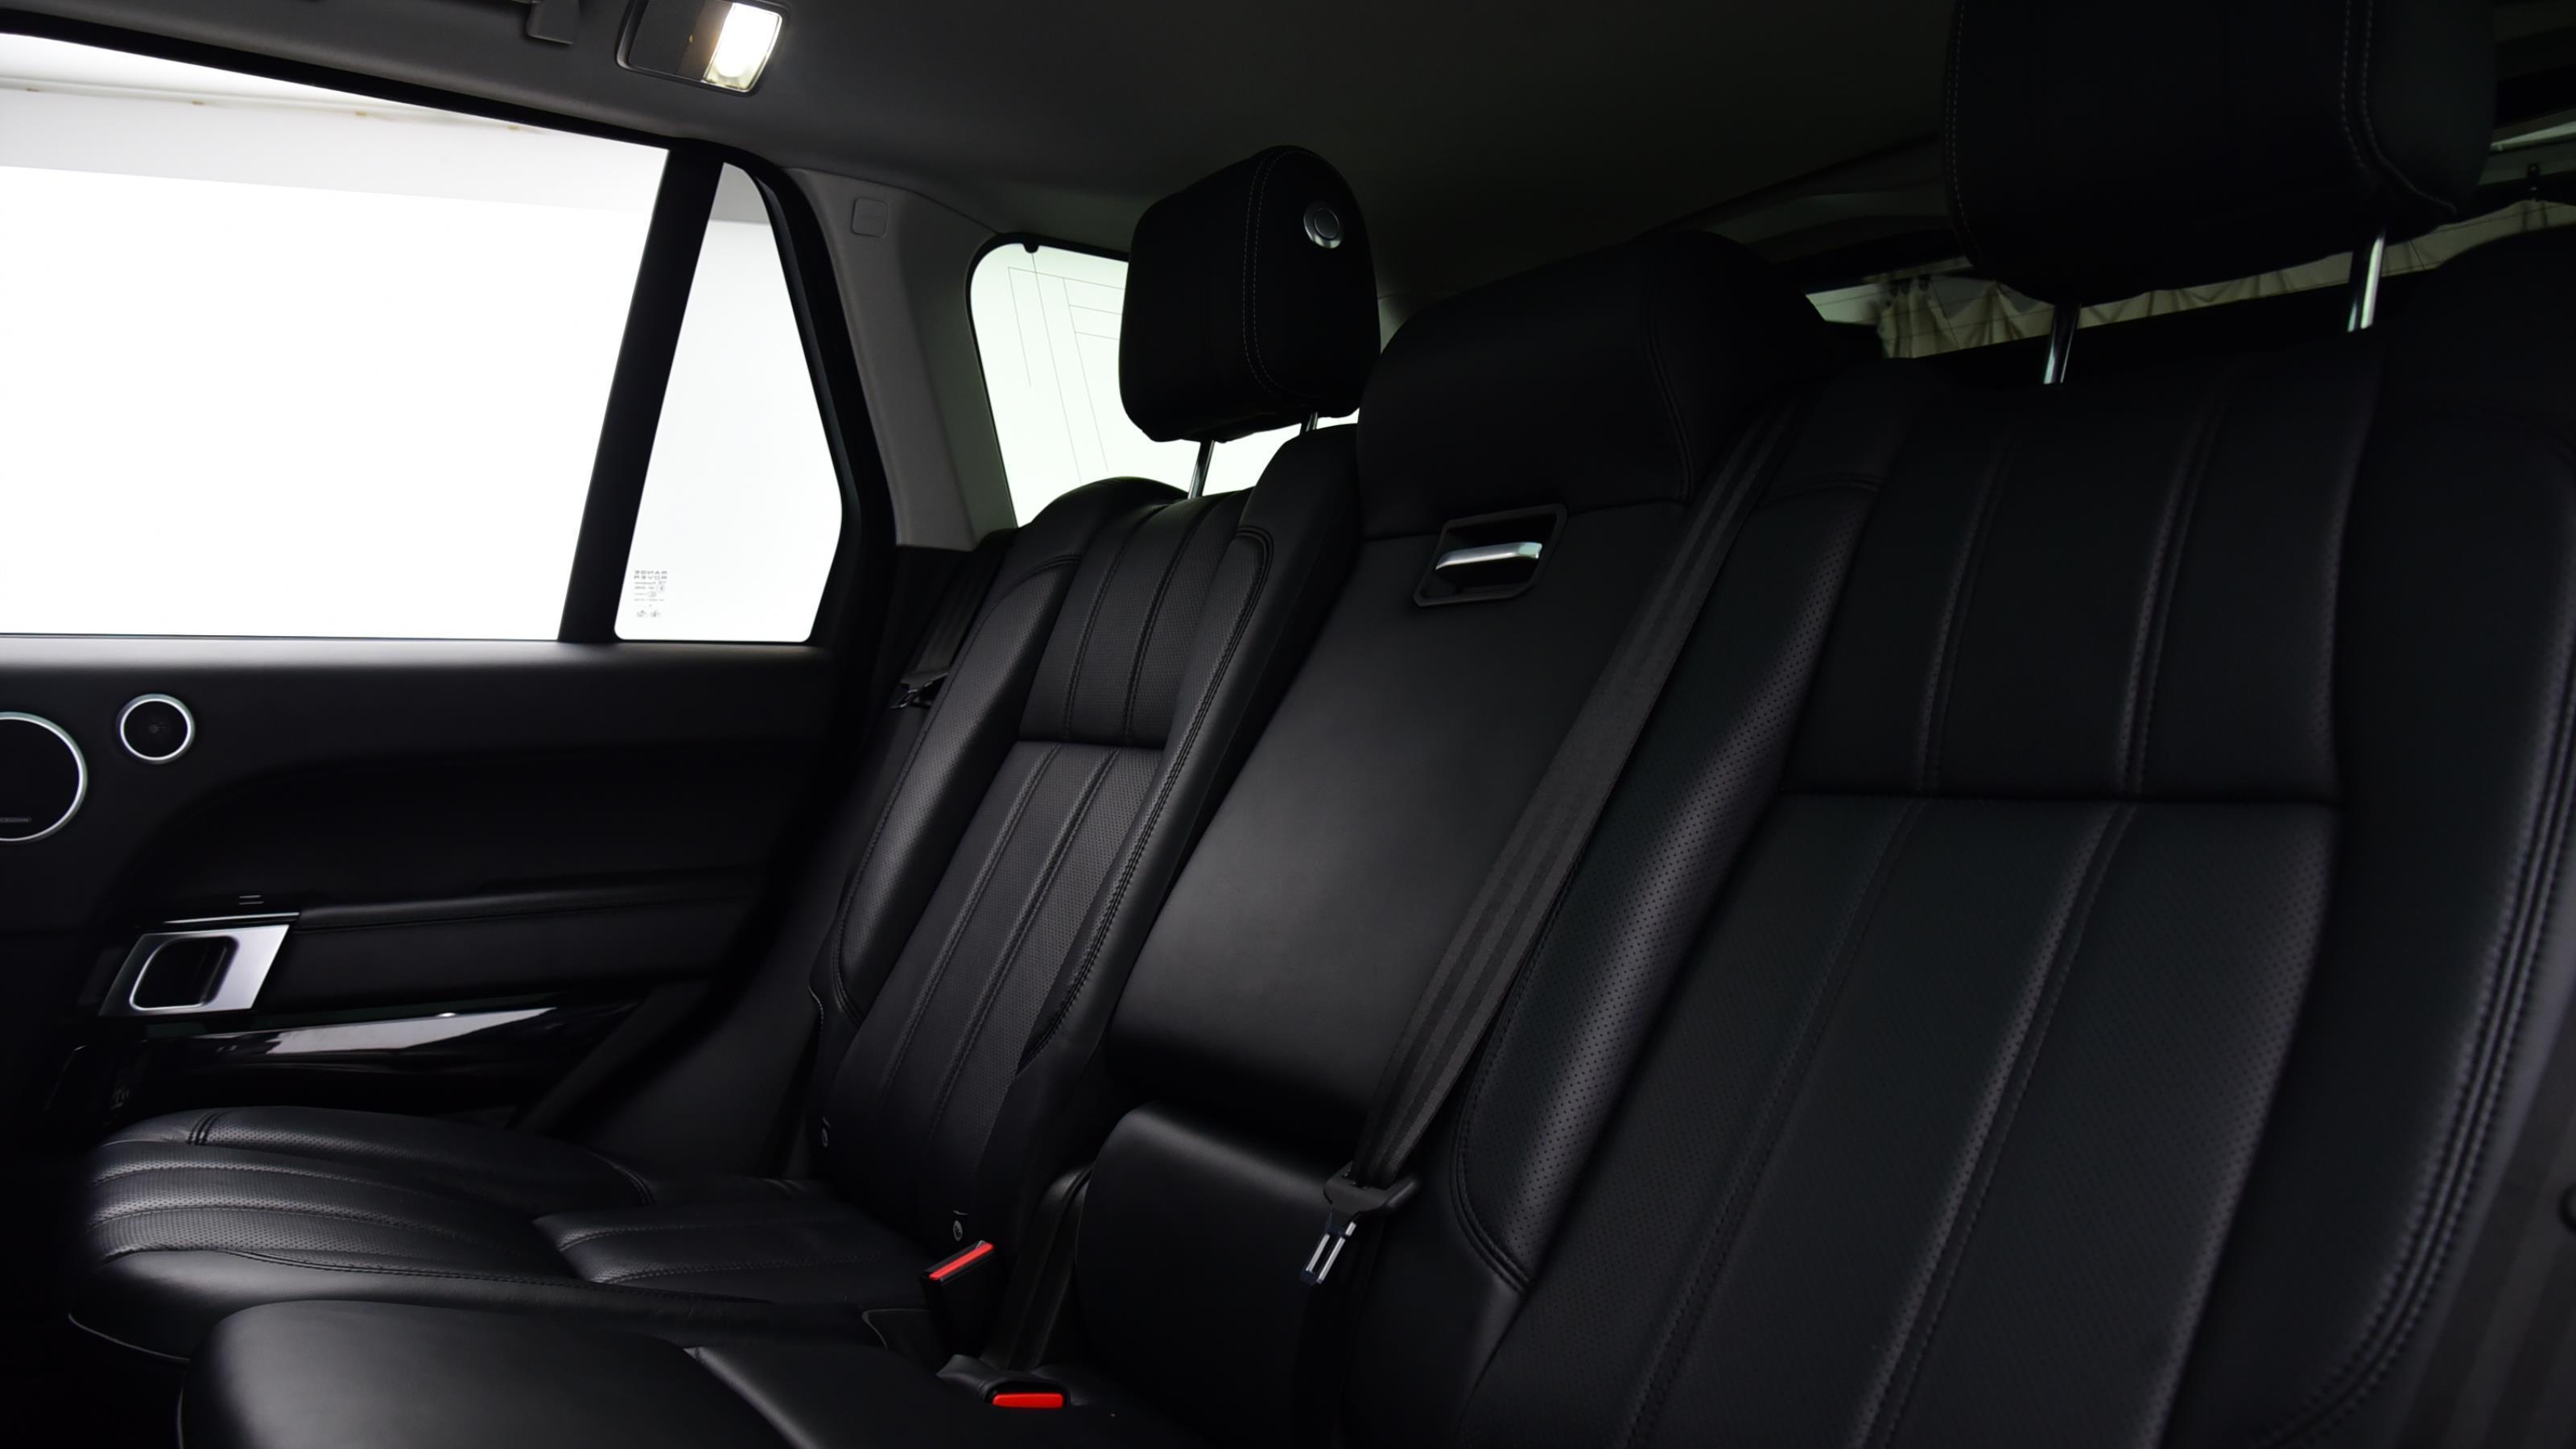 Used 2016 Land Rover RANGE ROVER 3.0 TDV6 Vogue SE 4dr Auto GREY at Saxton4x4